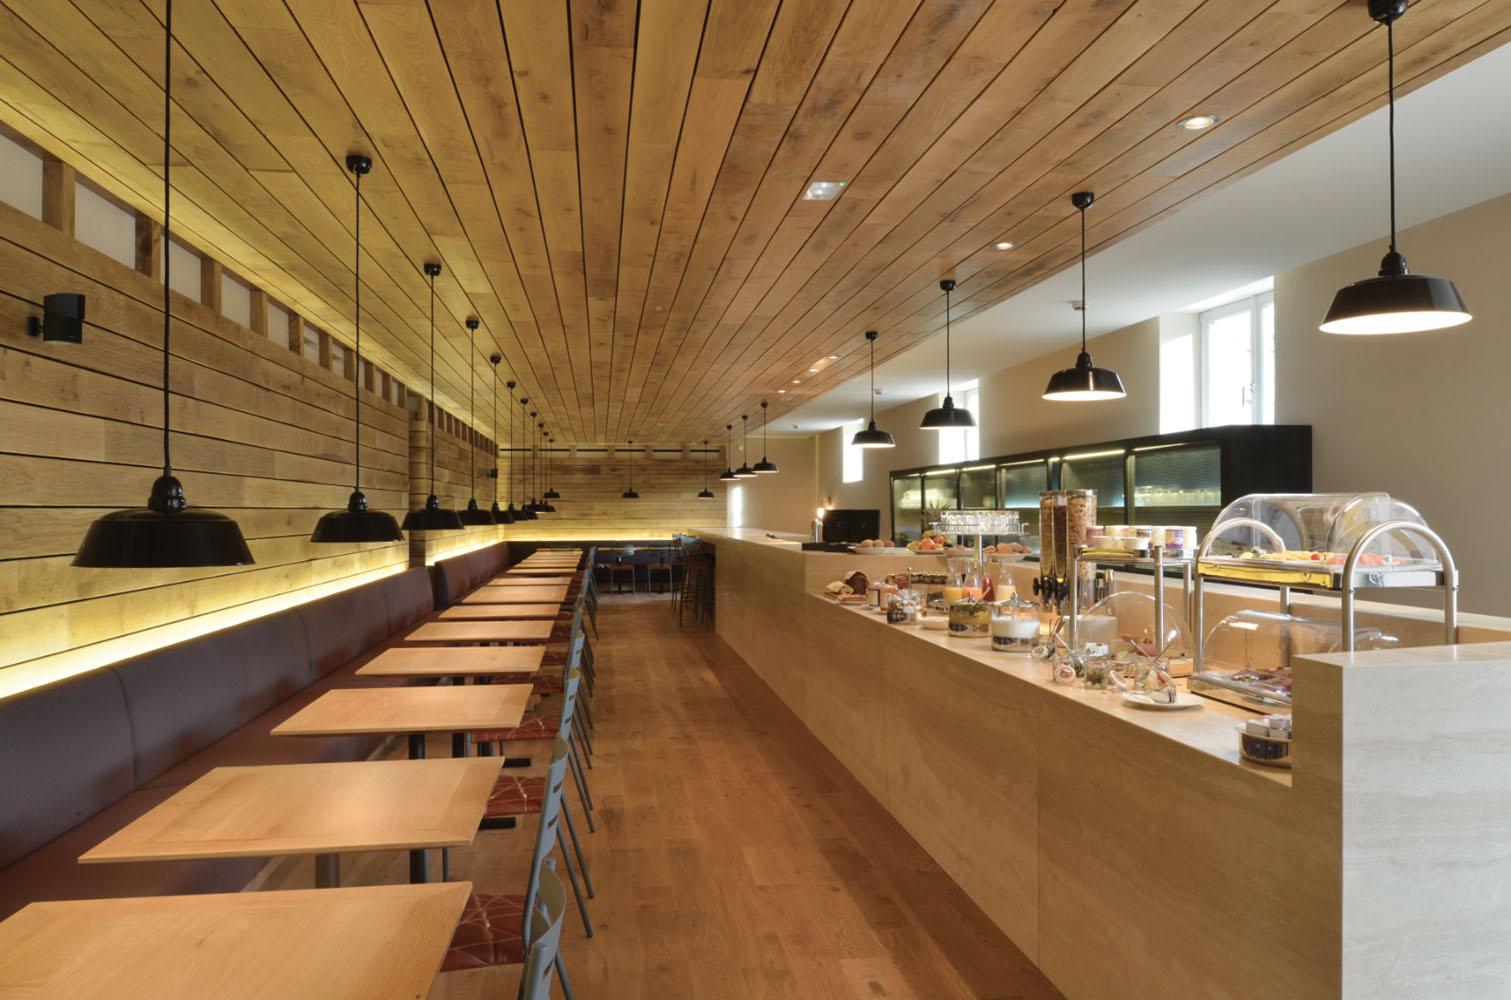 Restaurants brasserie les haras pour votre conf rence strasbourg scb - Les harras strasbourg ...